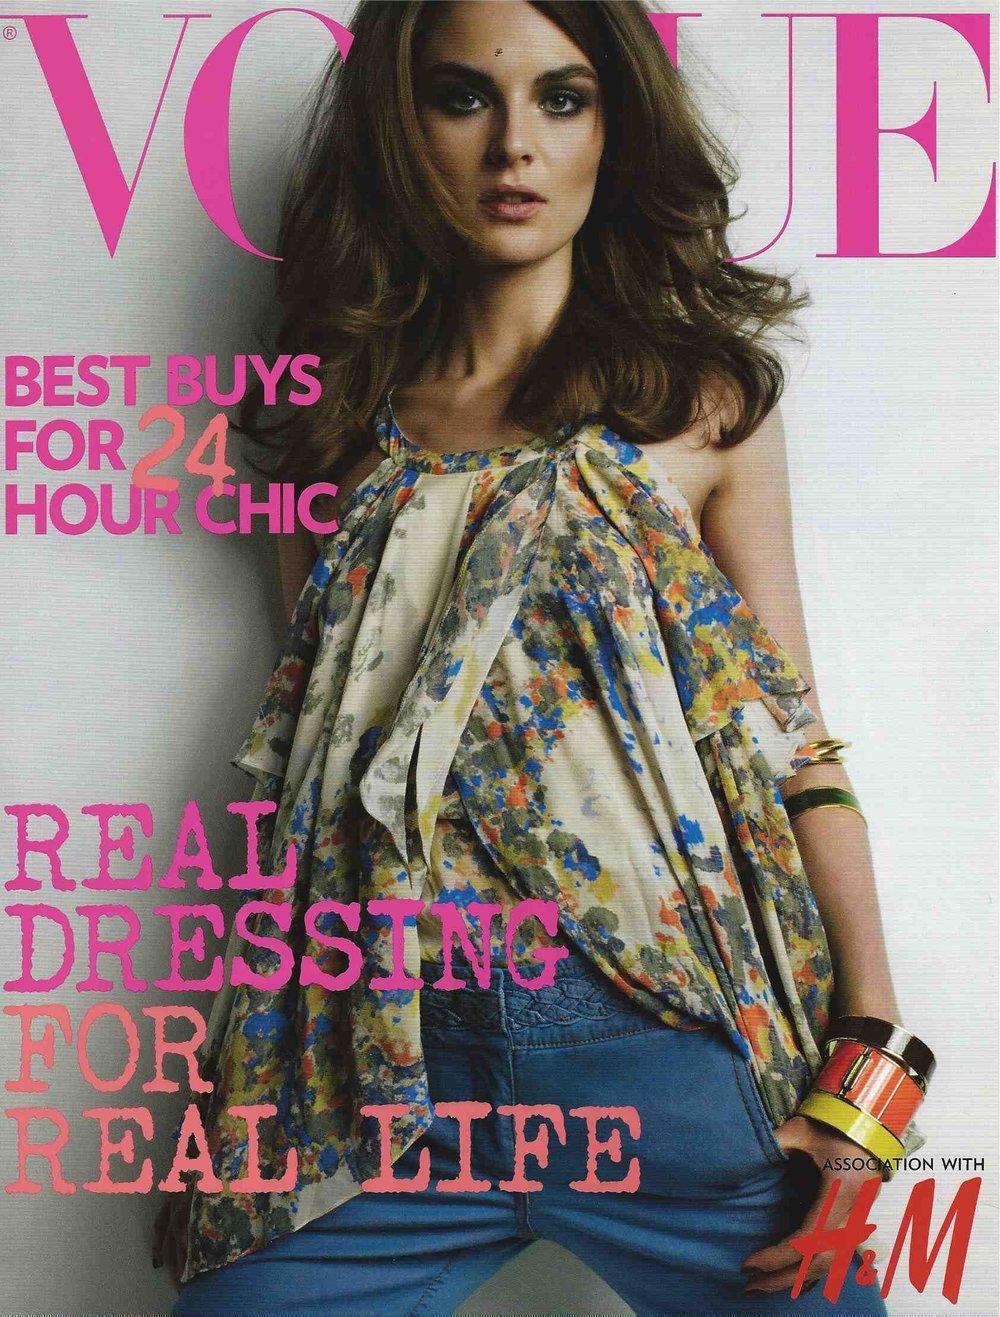 Robin Derrick - British Vogue Cover - Anouck Lepere copy.jpg